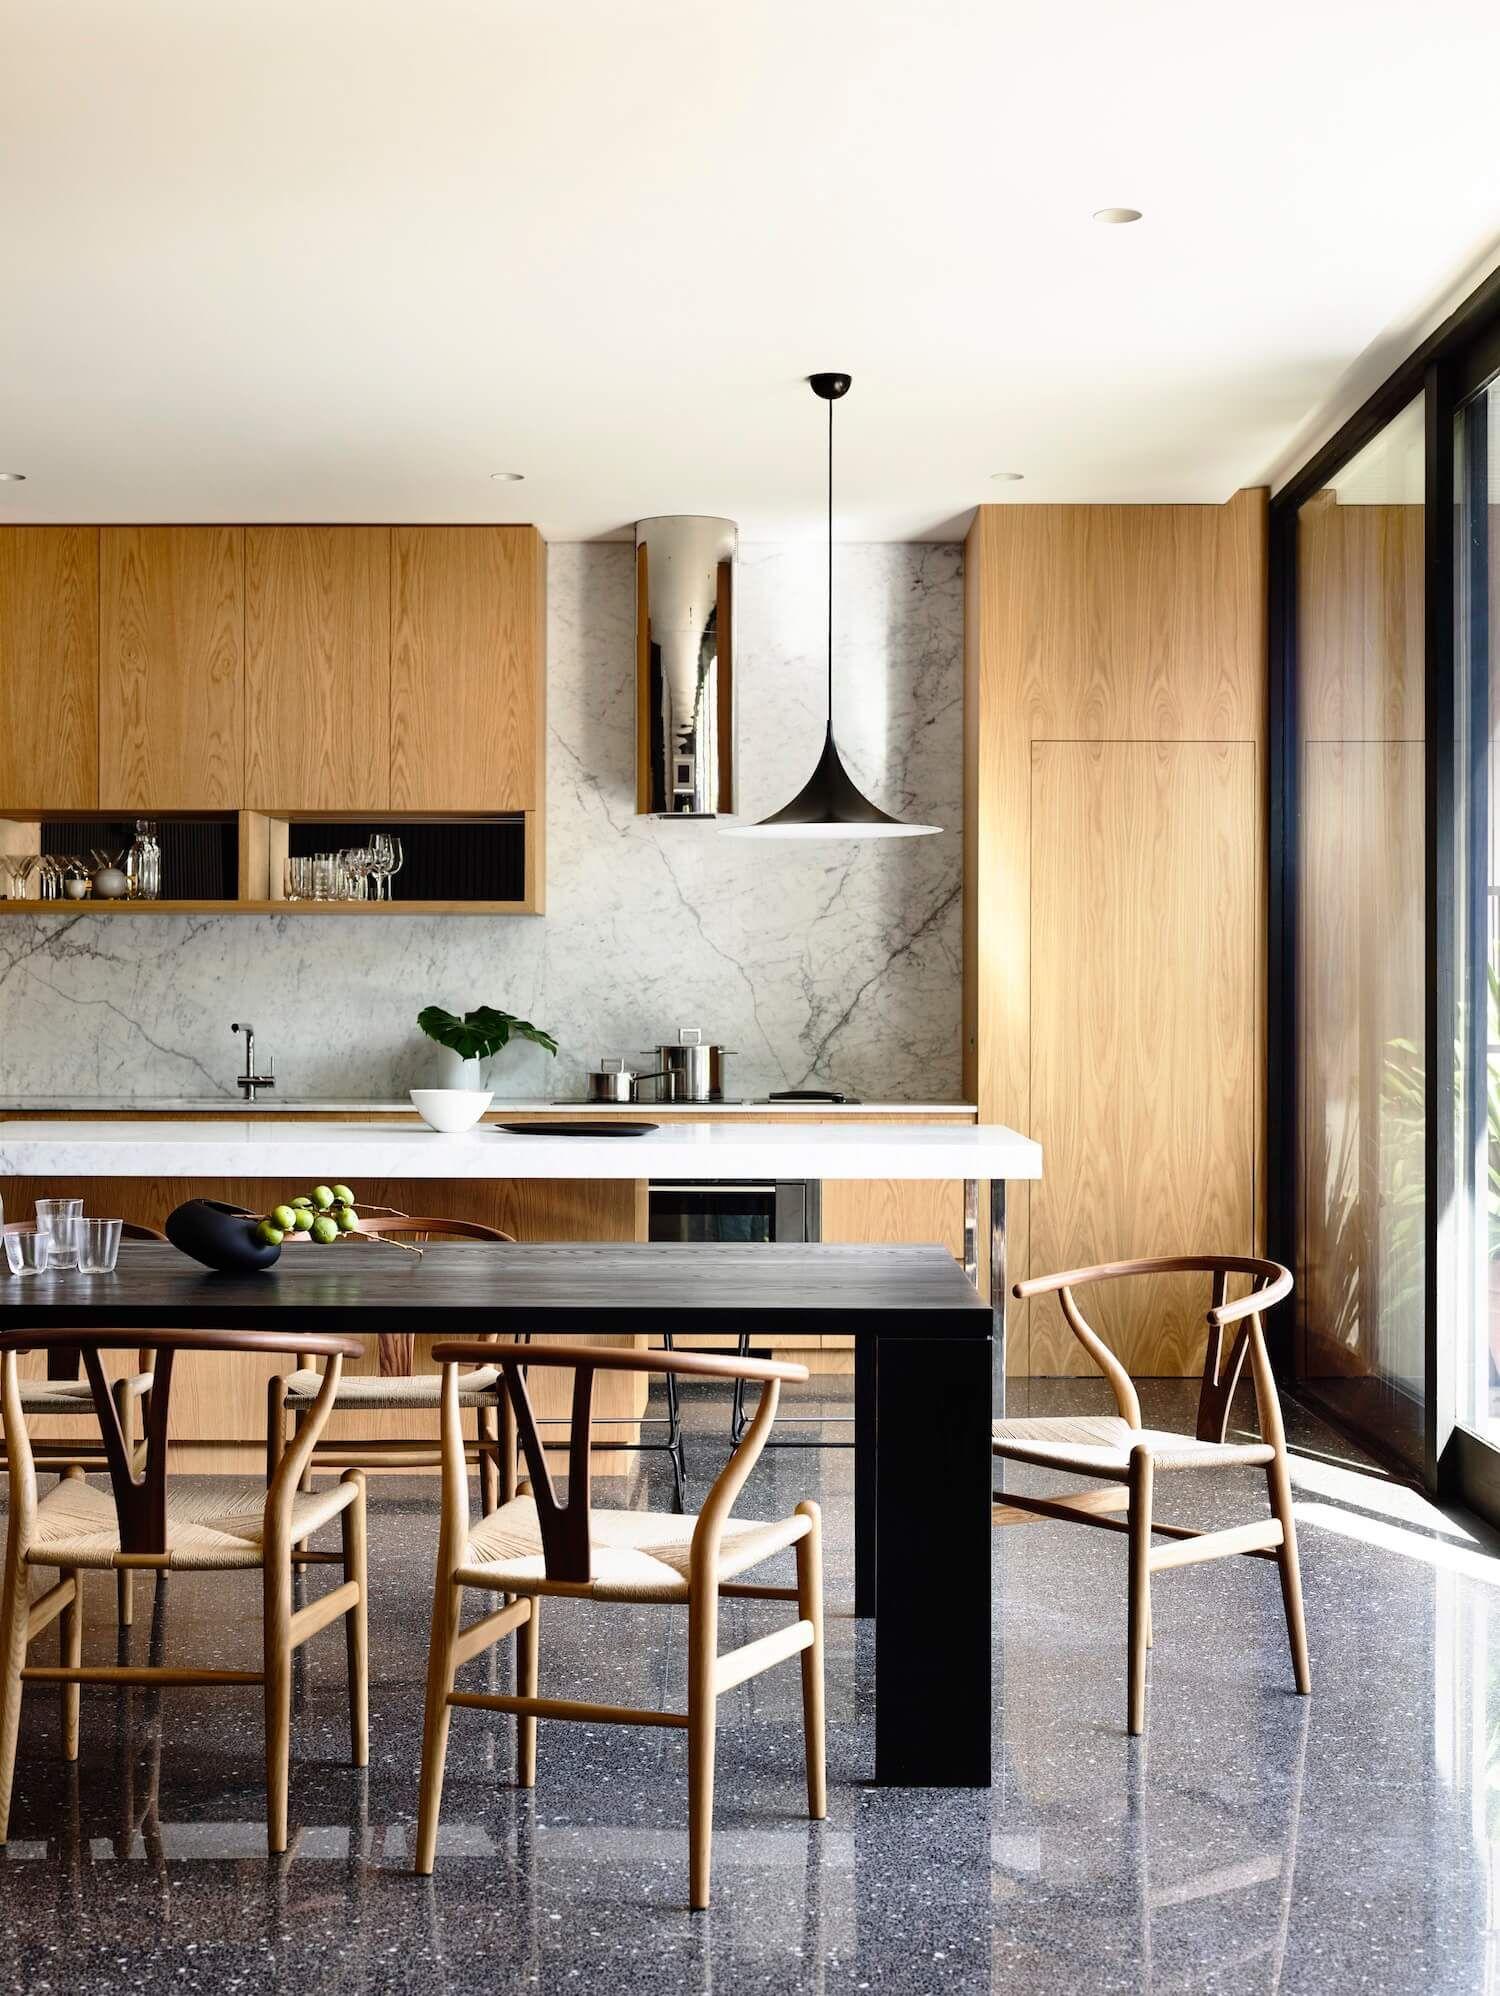 Malvern Townhouse by Pandolfini Architects | Kitchens | Pinterest ...